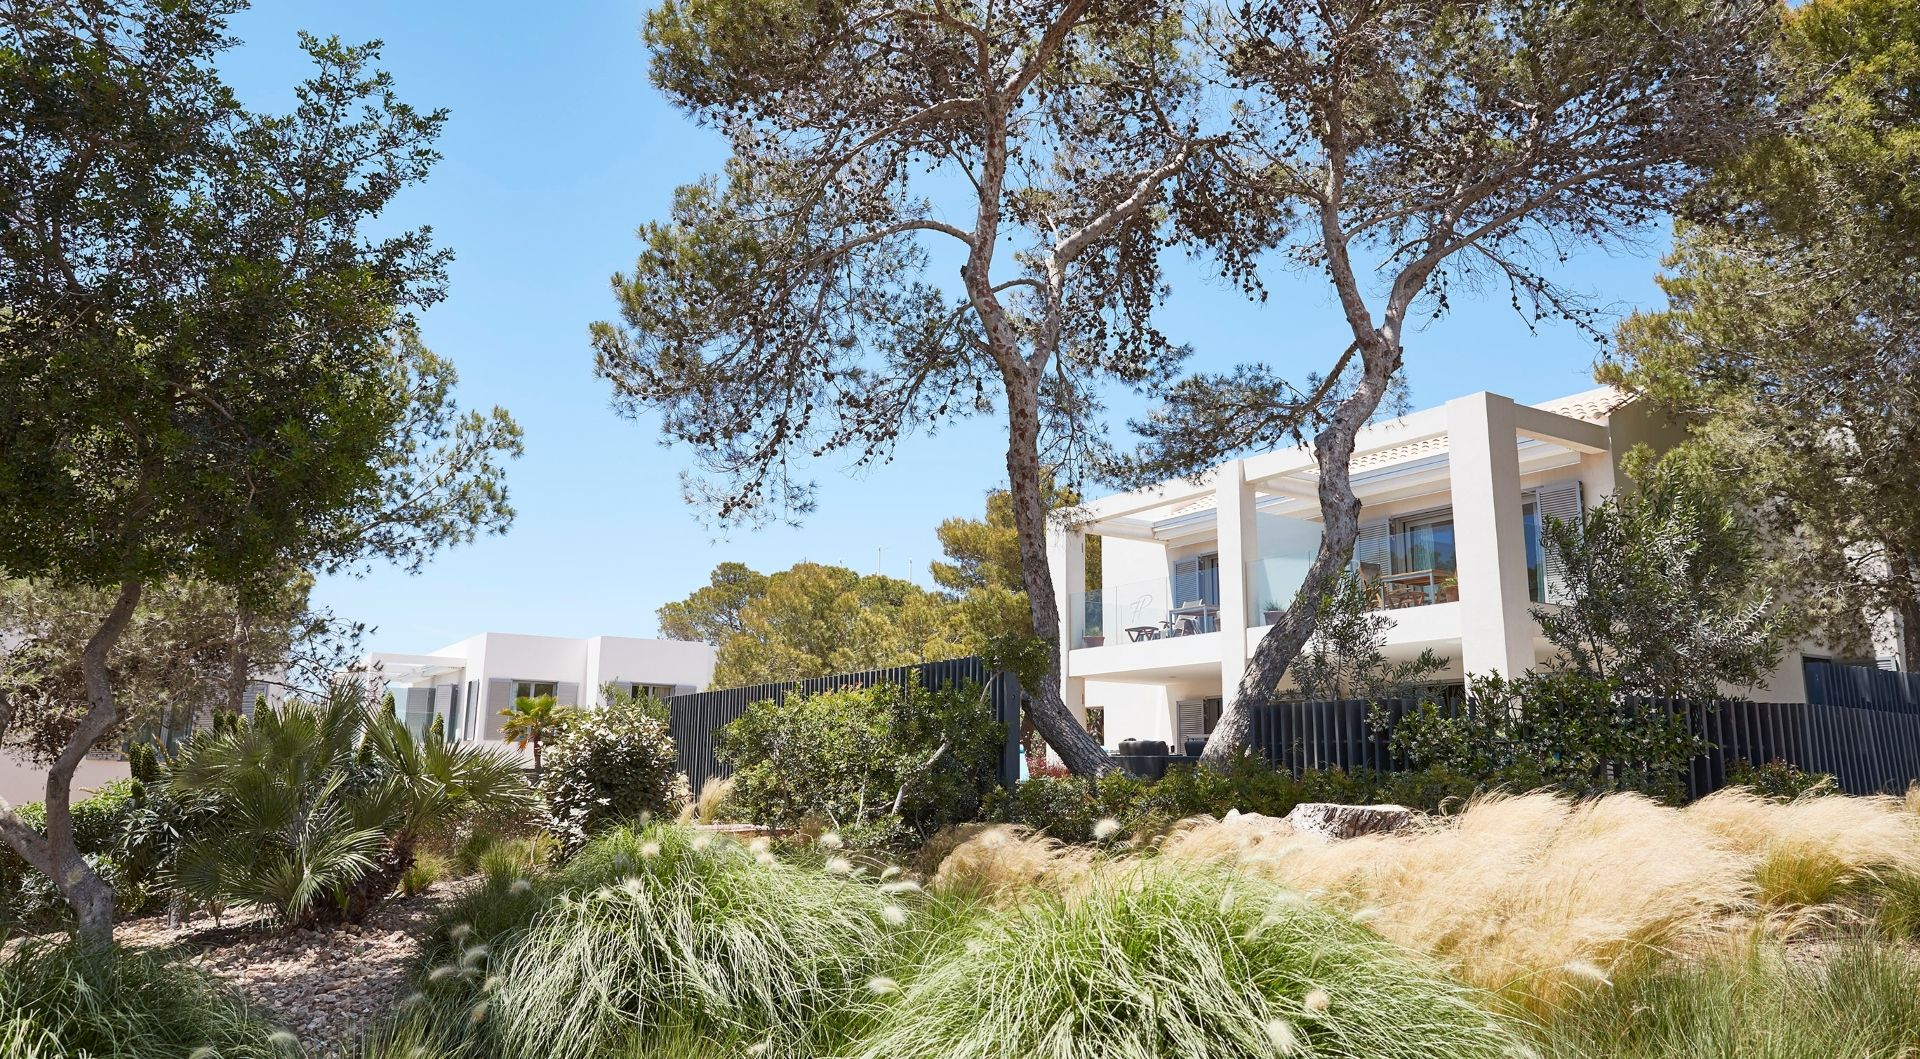 Ibizan Village Suites